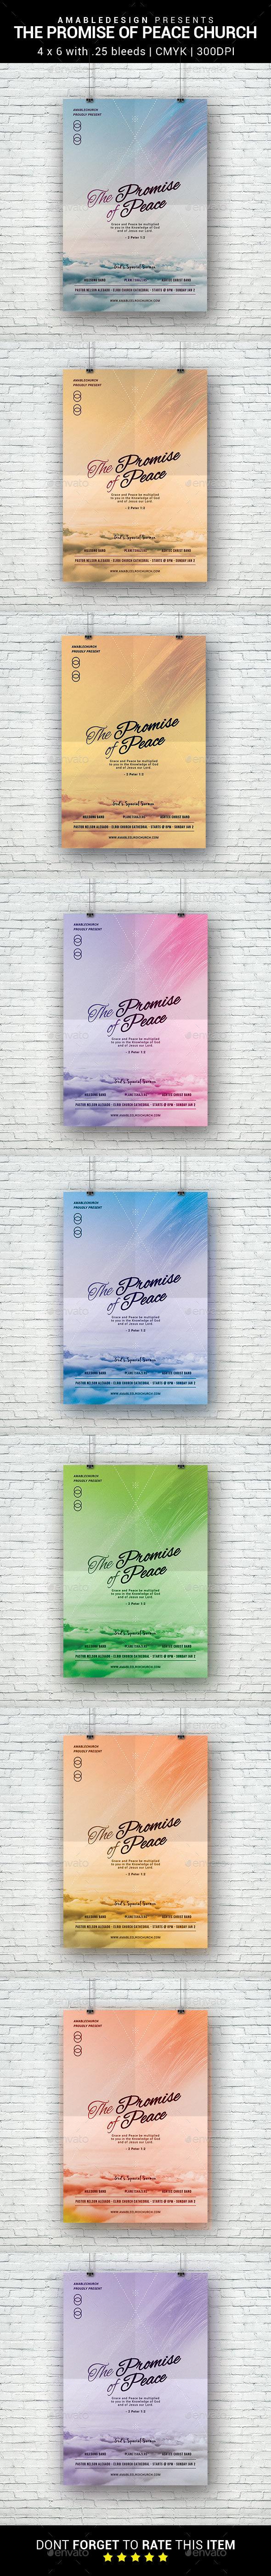 The Promise of Peace Church Flyer - Church Flyers